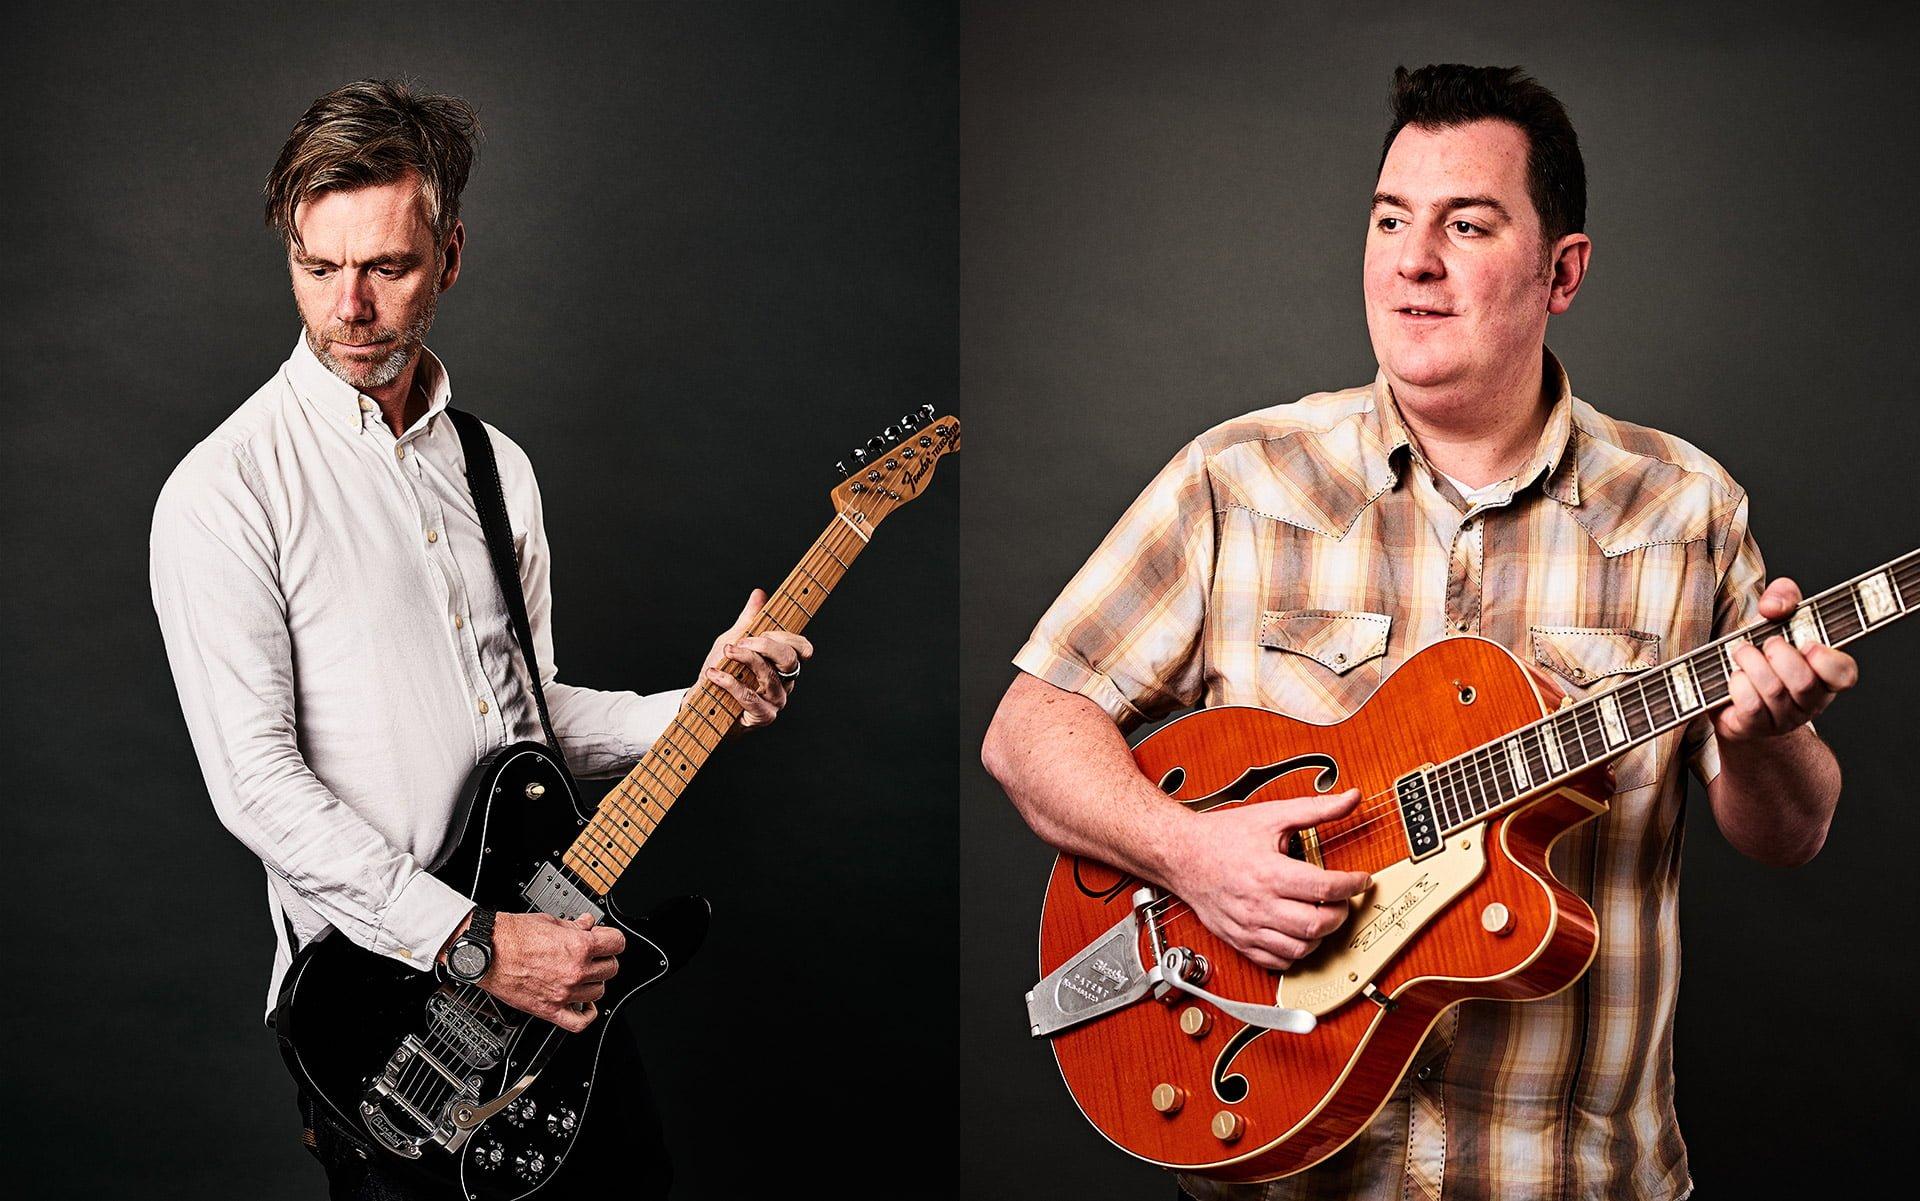 Fender-corporate-photographer-london-brighton